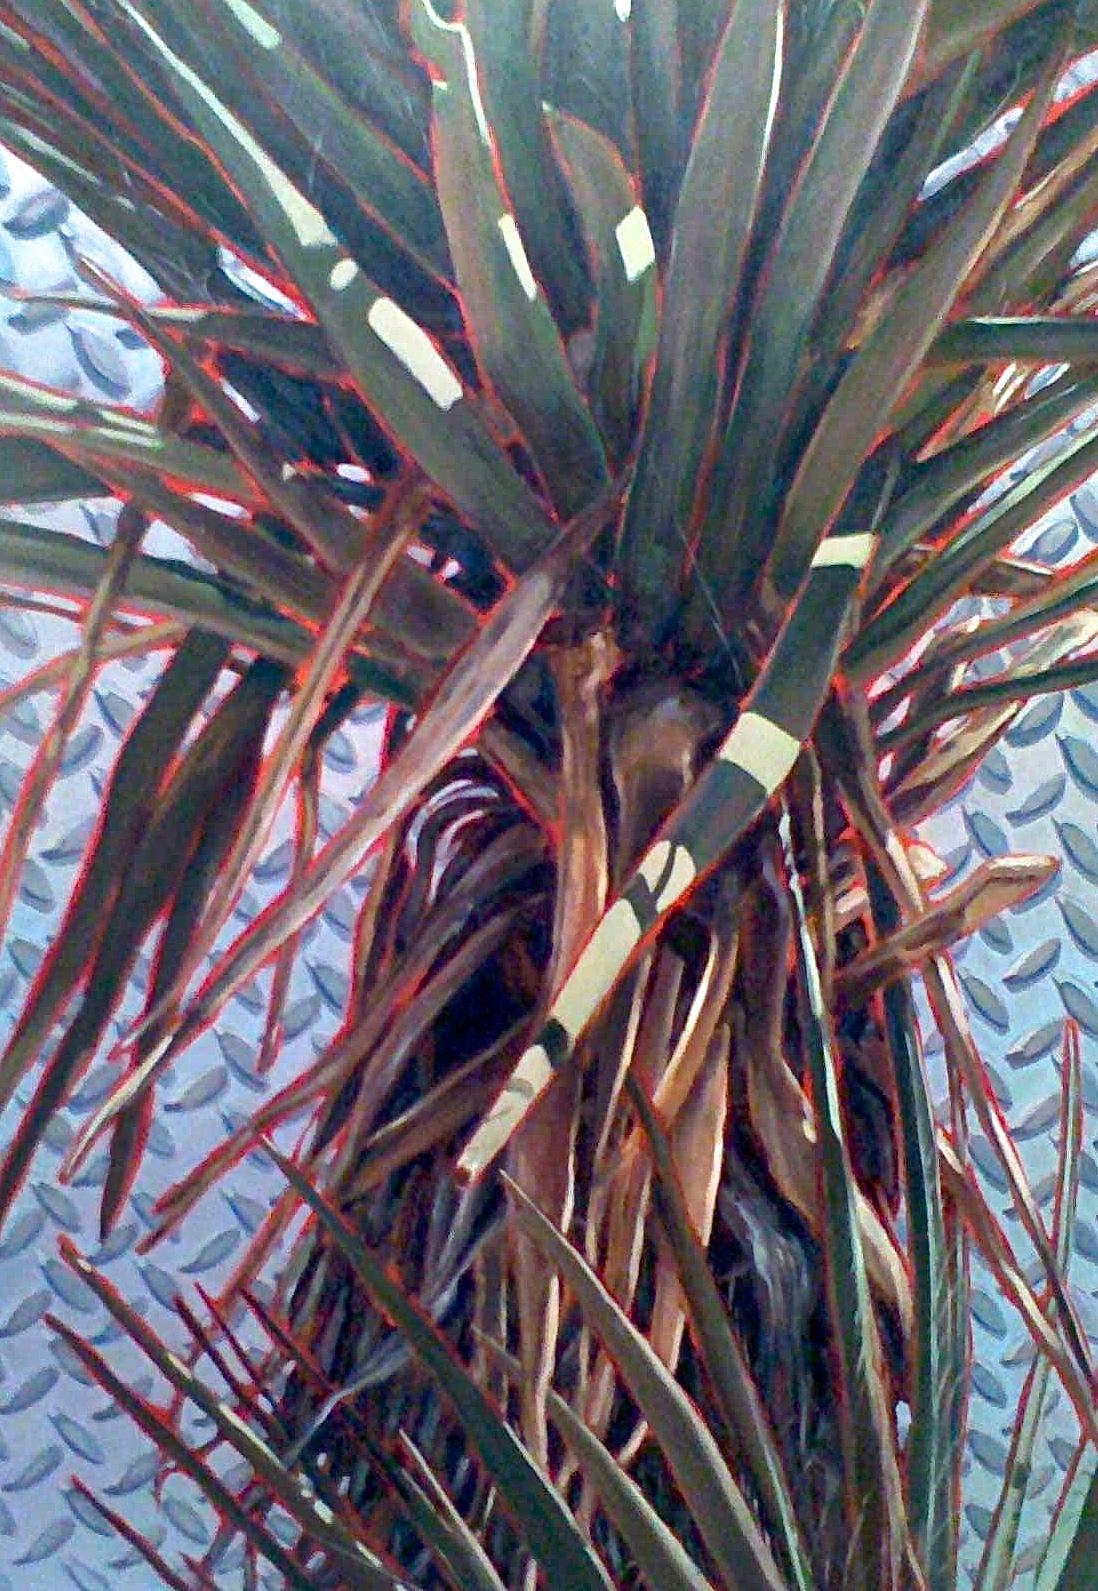 Inorganic (Yucca and Metal)